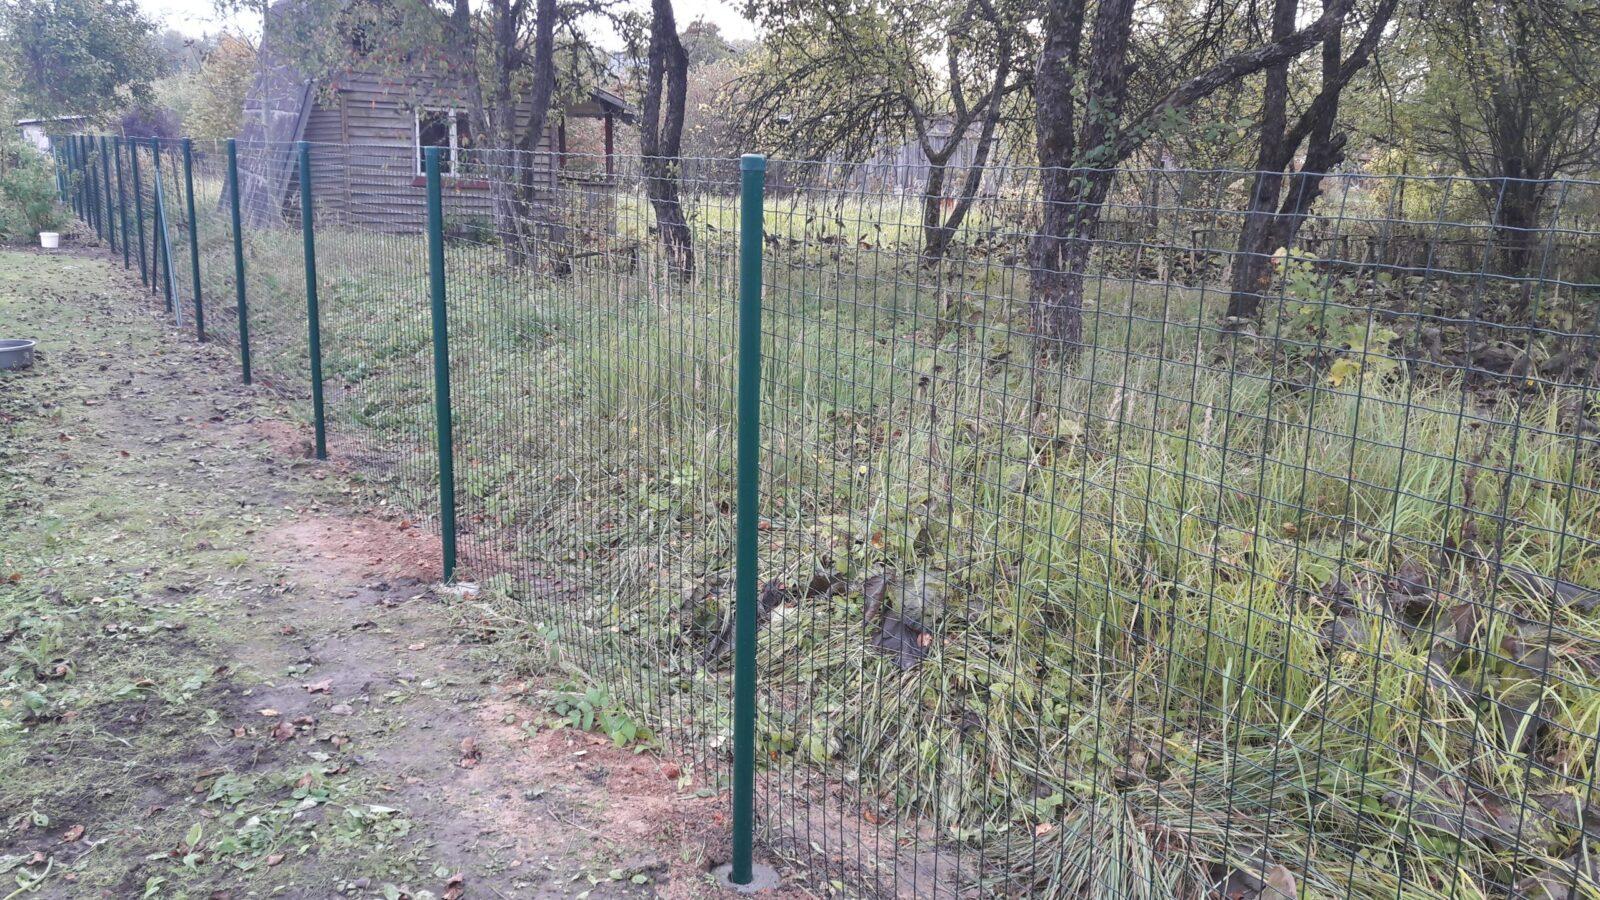 https://zogs.lv/wp-content/uploads/2016/10/Metinātie-ruļļu-žogi-9-scaled.jpg